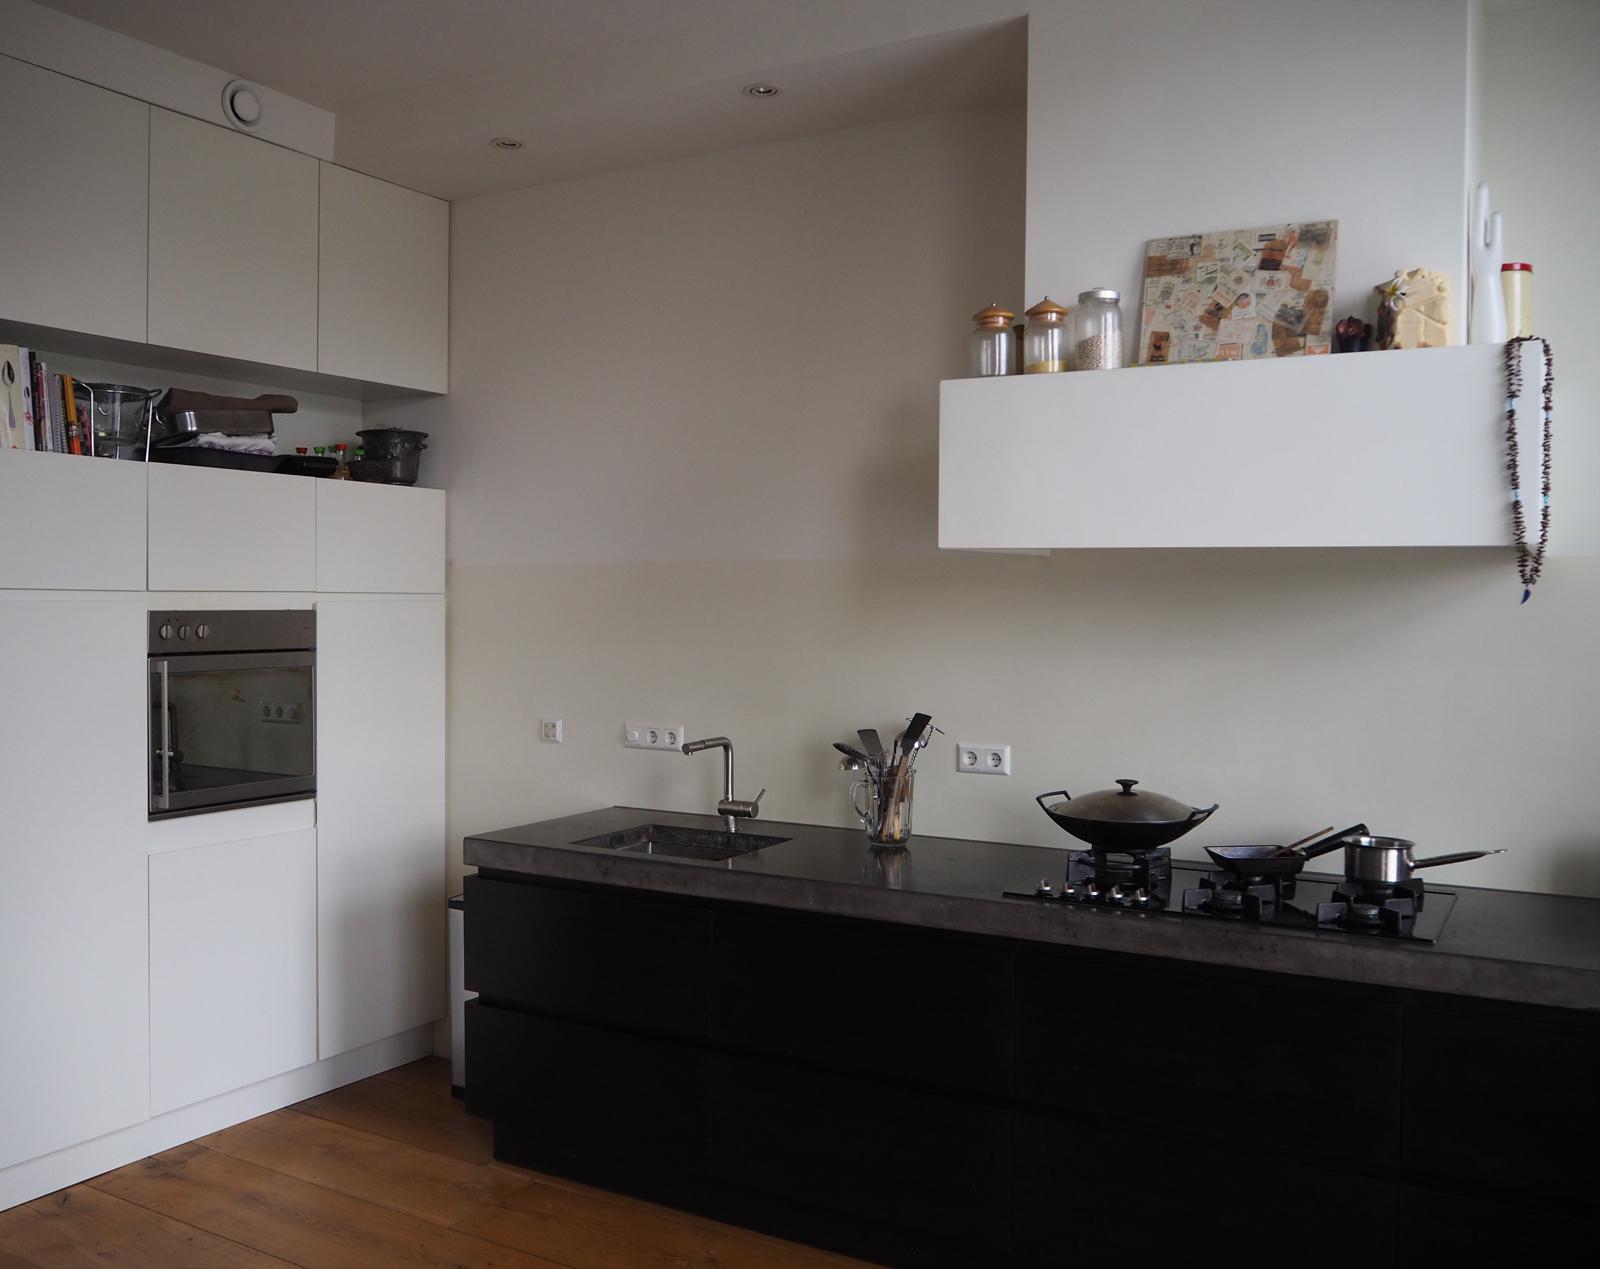 jeroendenijs-piano-kitchen-cabinet